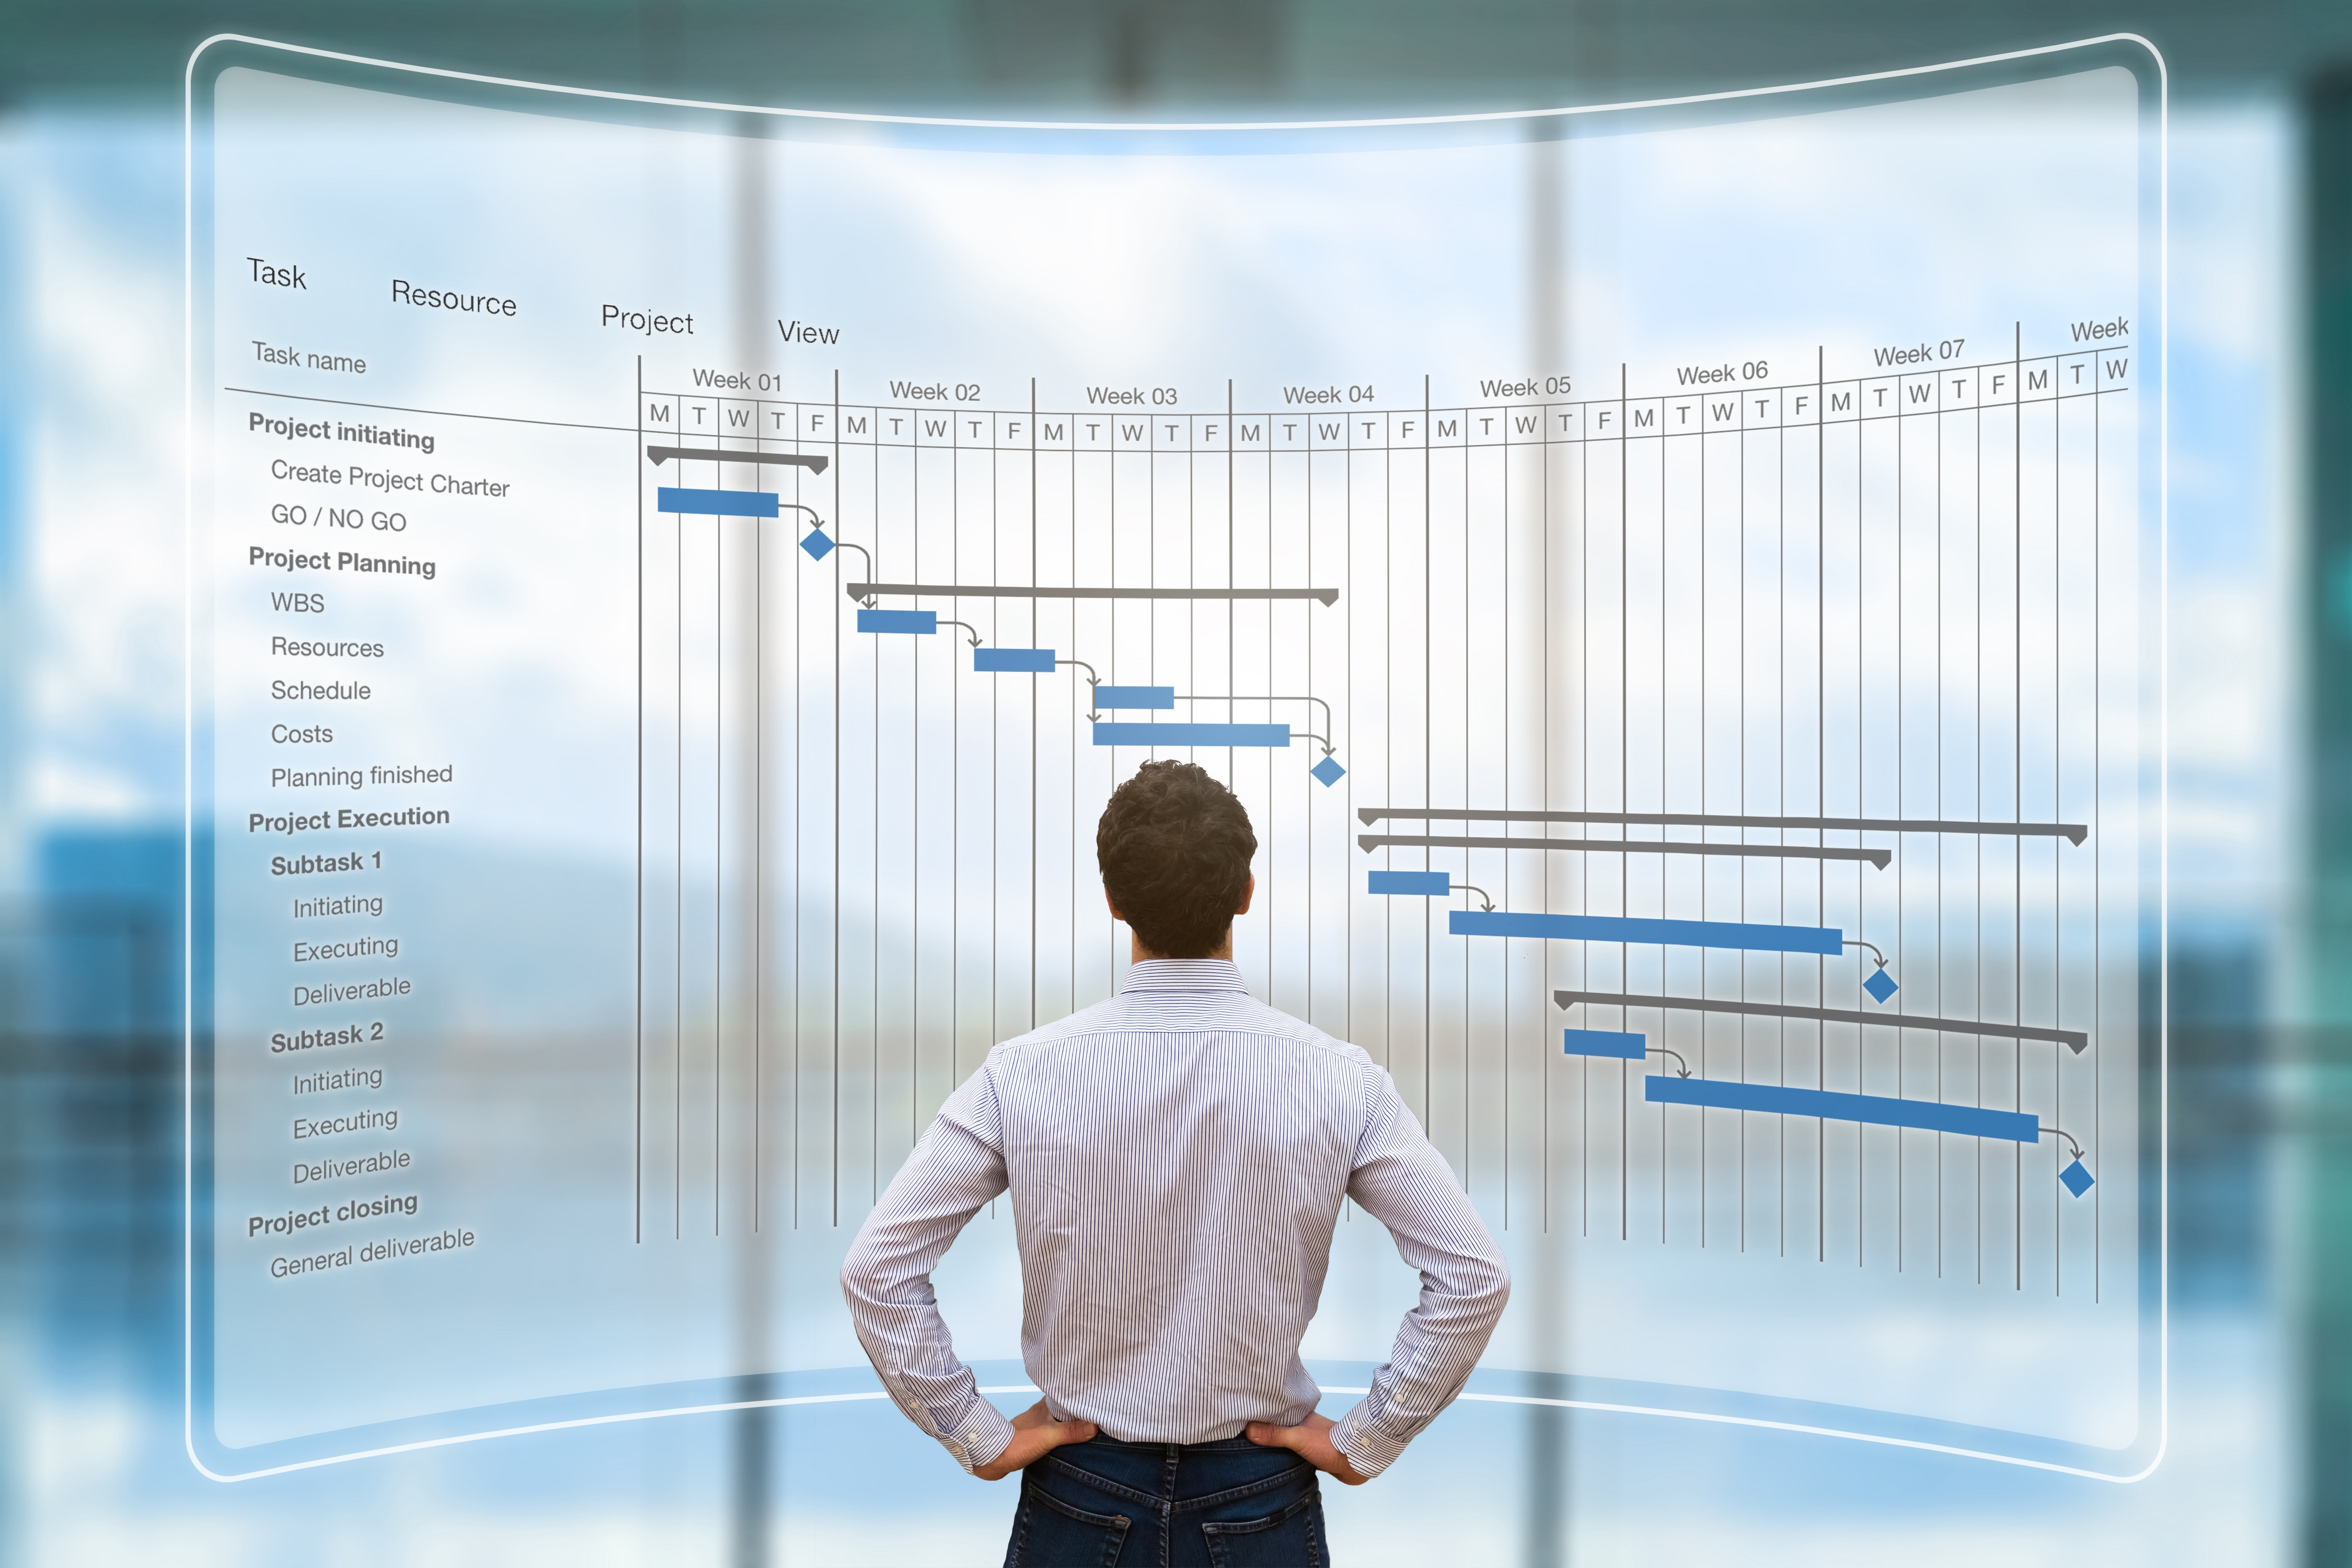 Re-engineering business processes using Gantt chart on AR screen